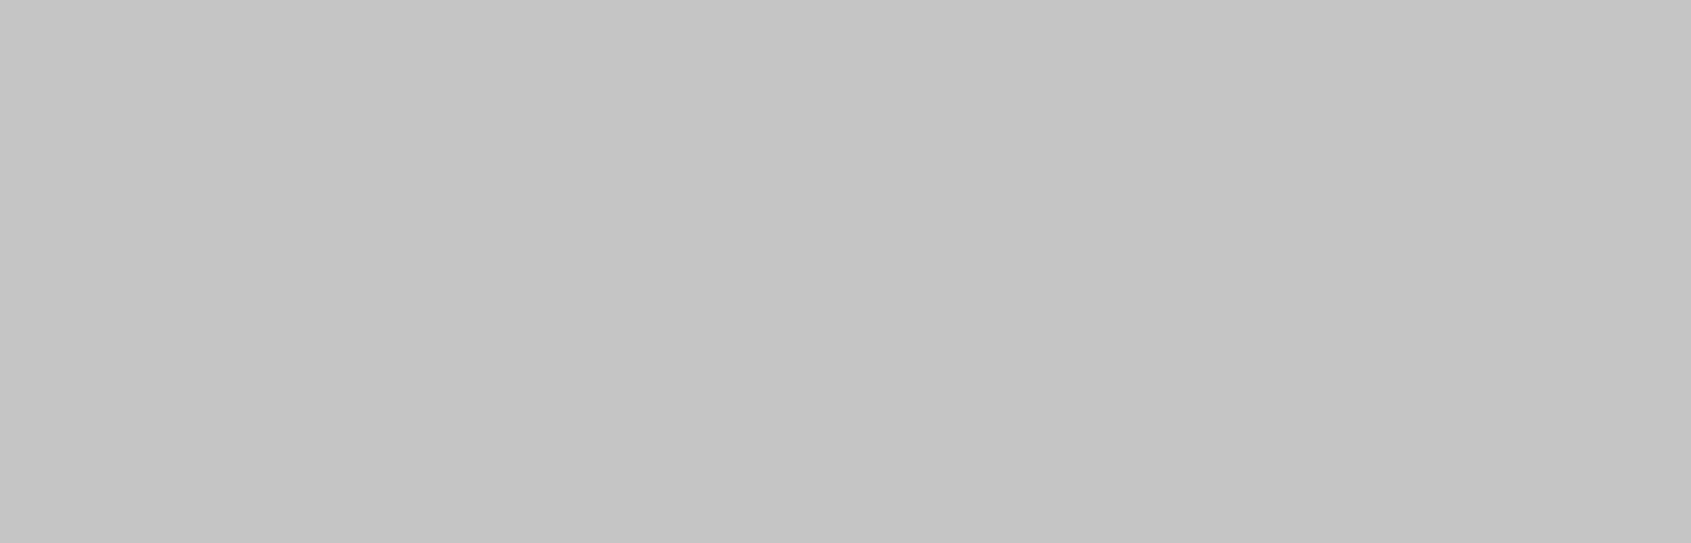 Wests logo